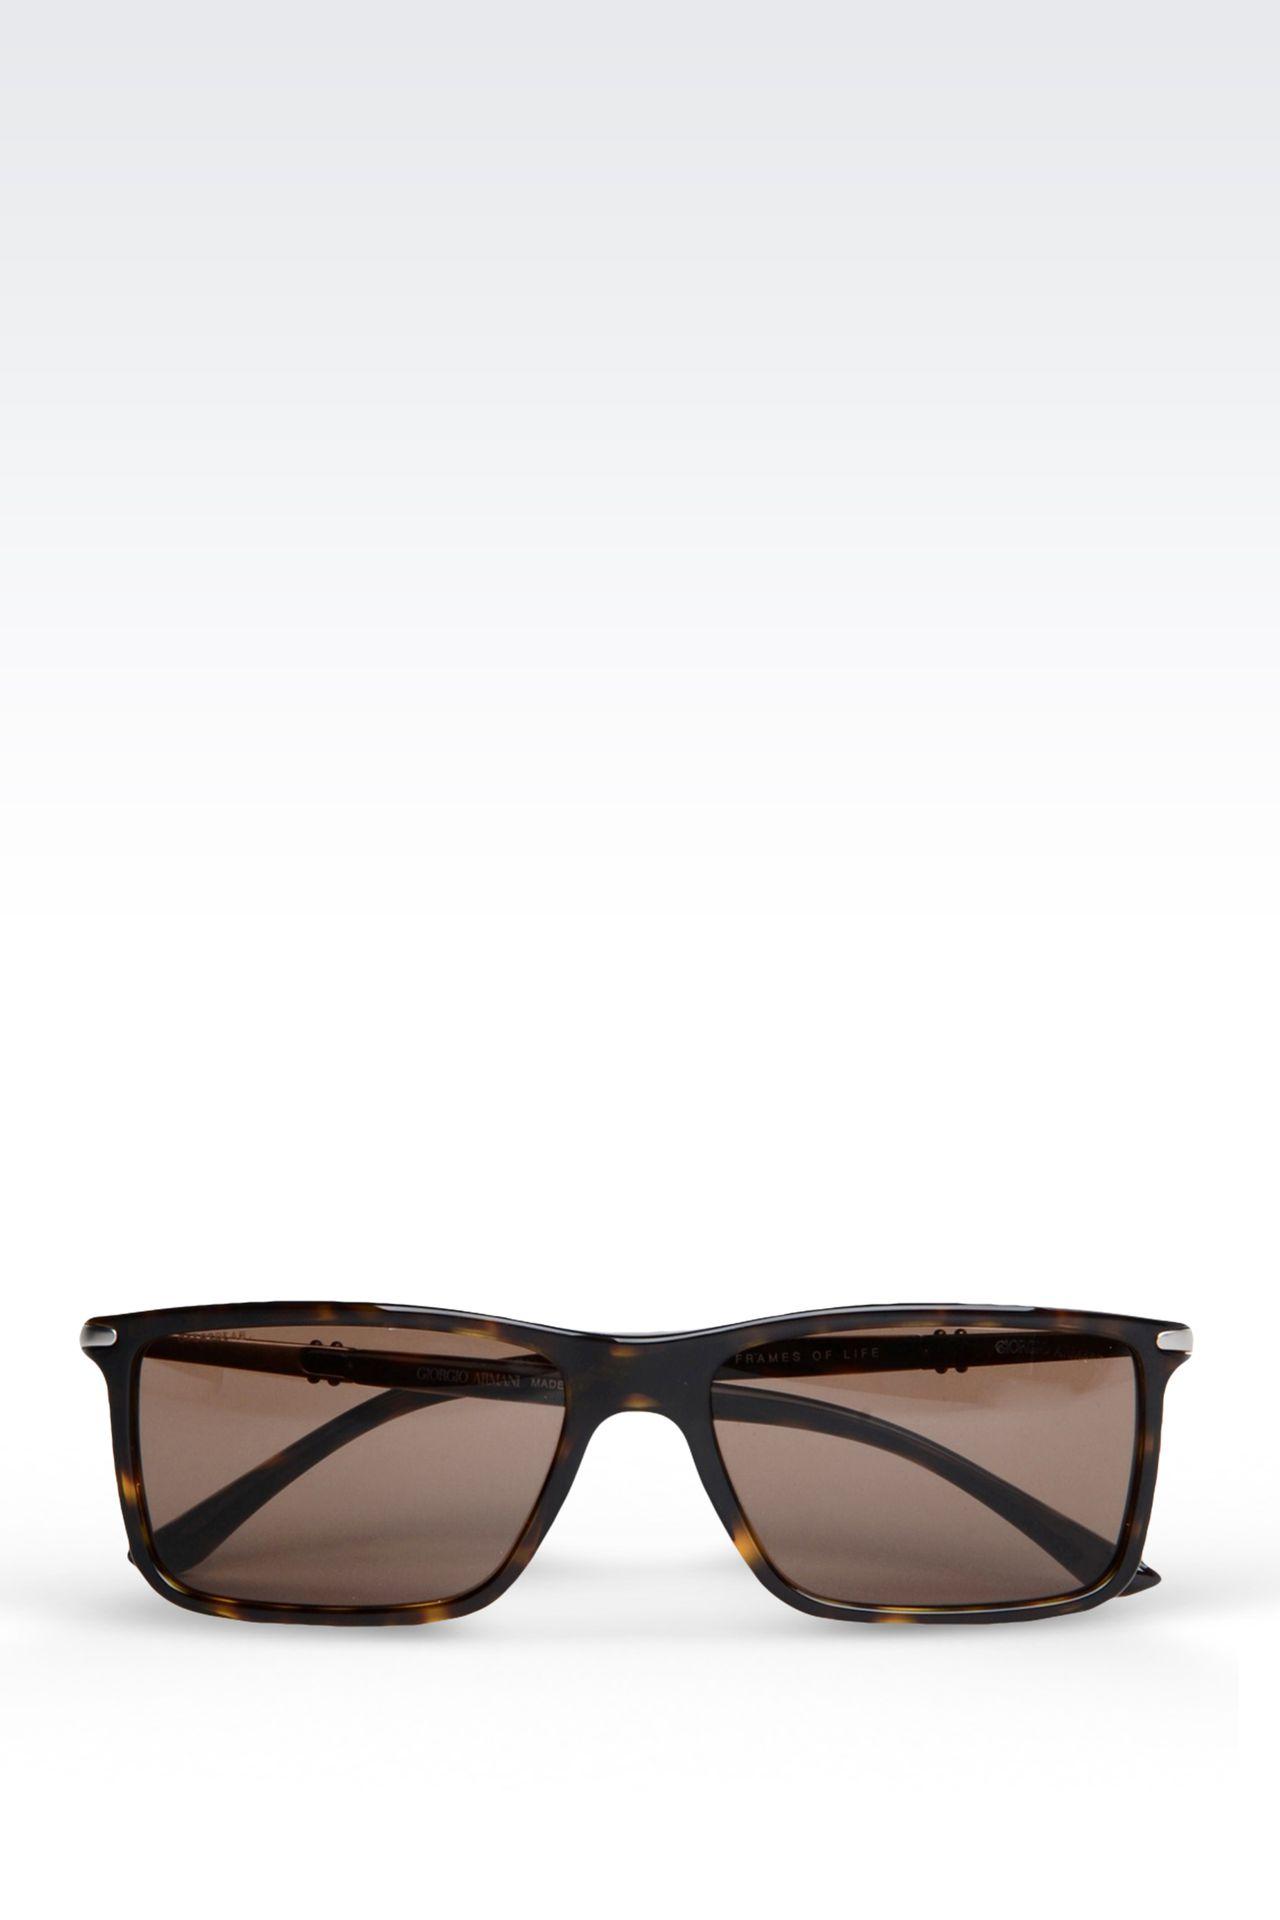 Armani Glasses For Men www.galleryhip.com - The Hippest Pics